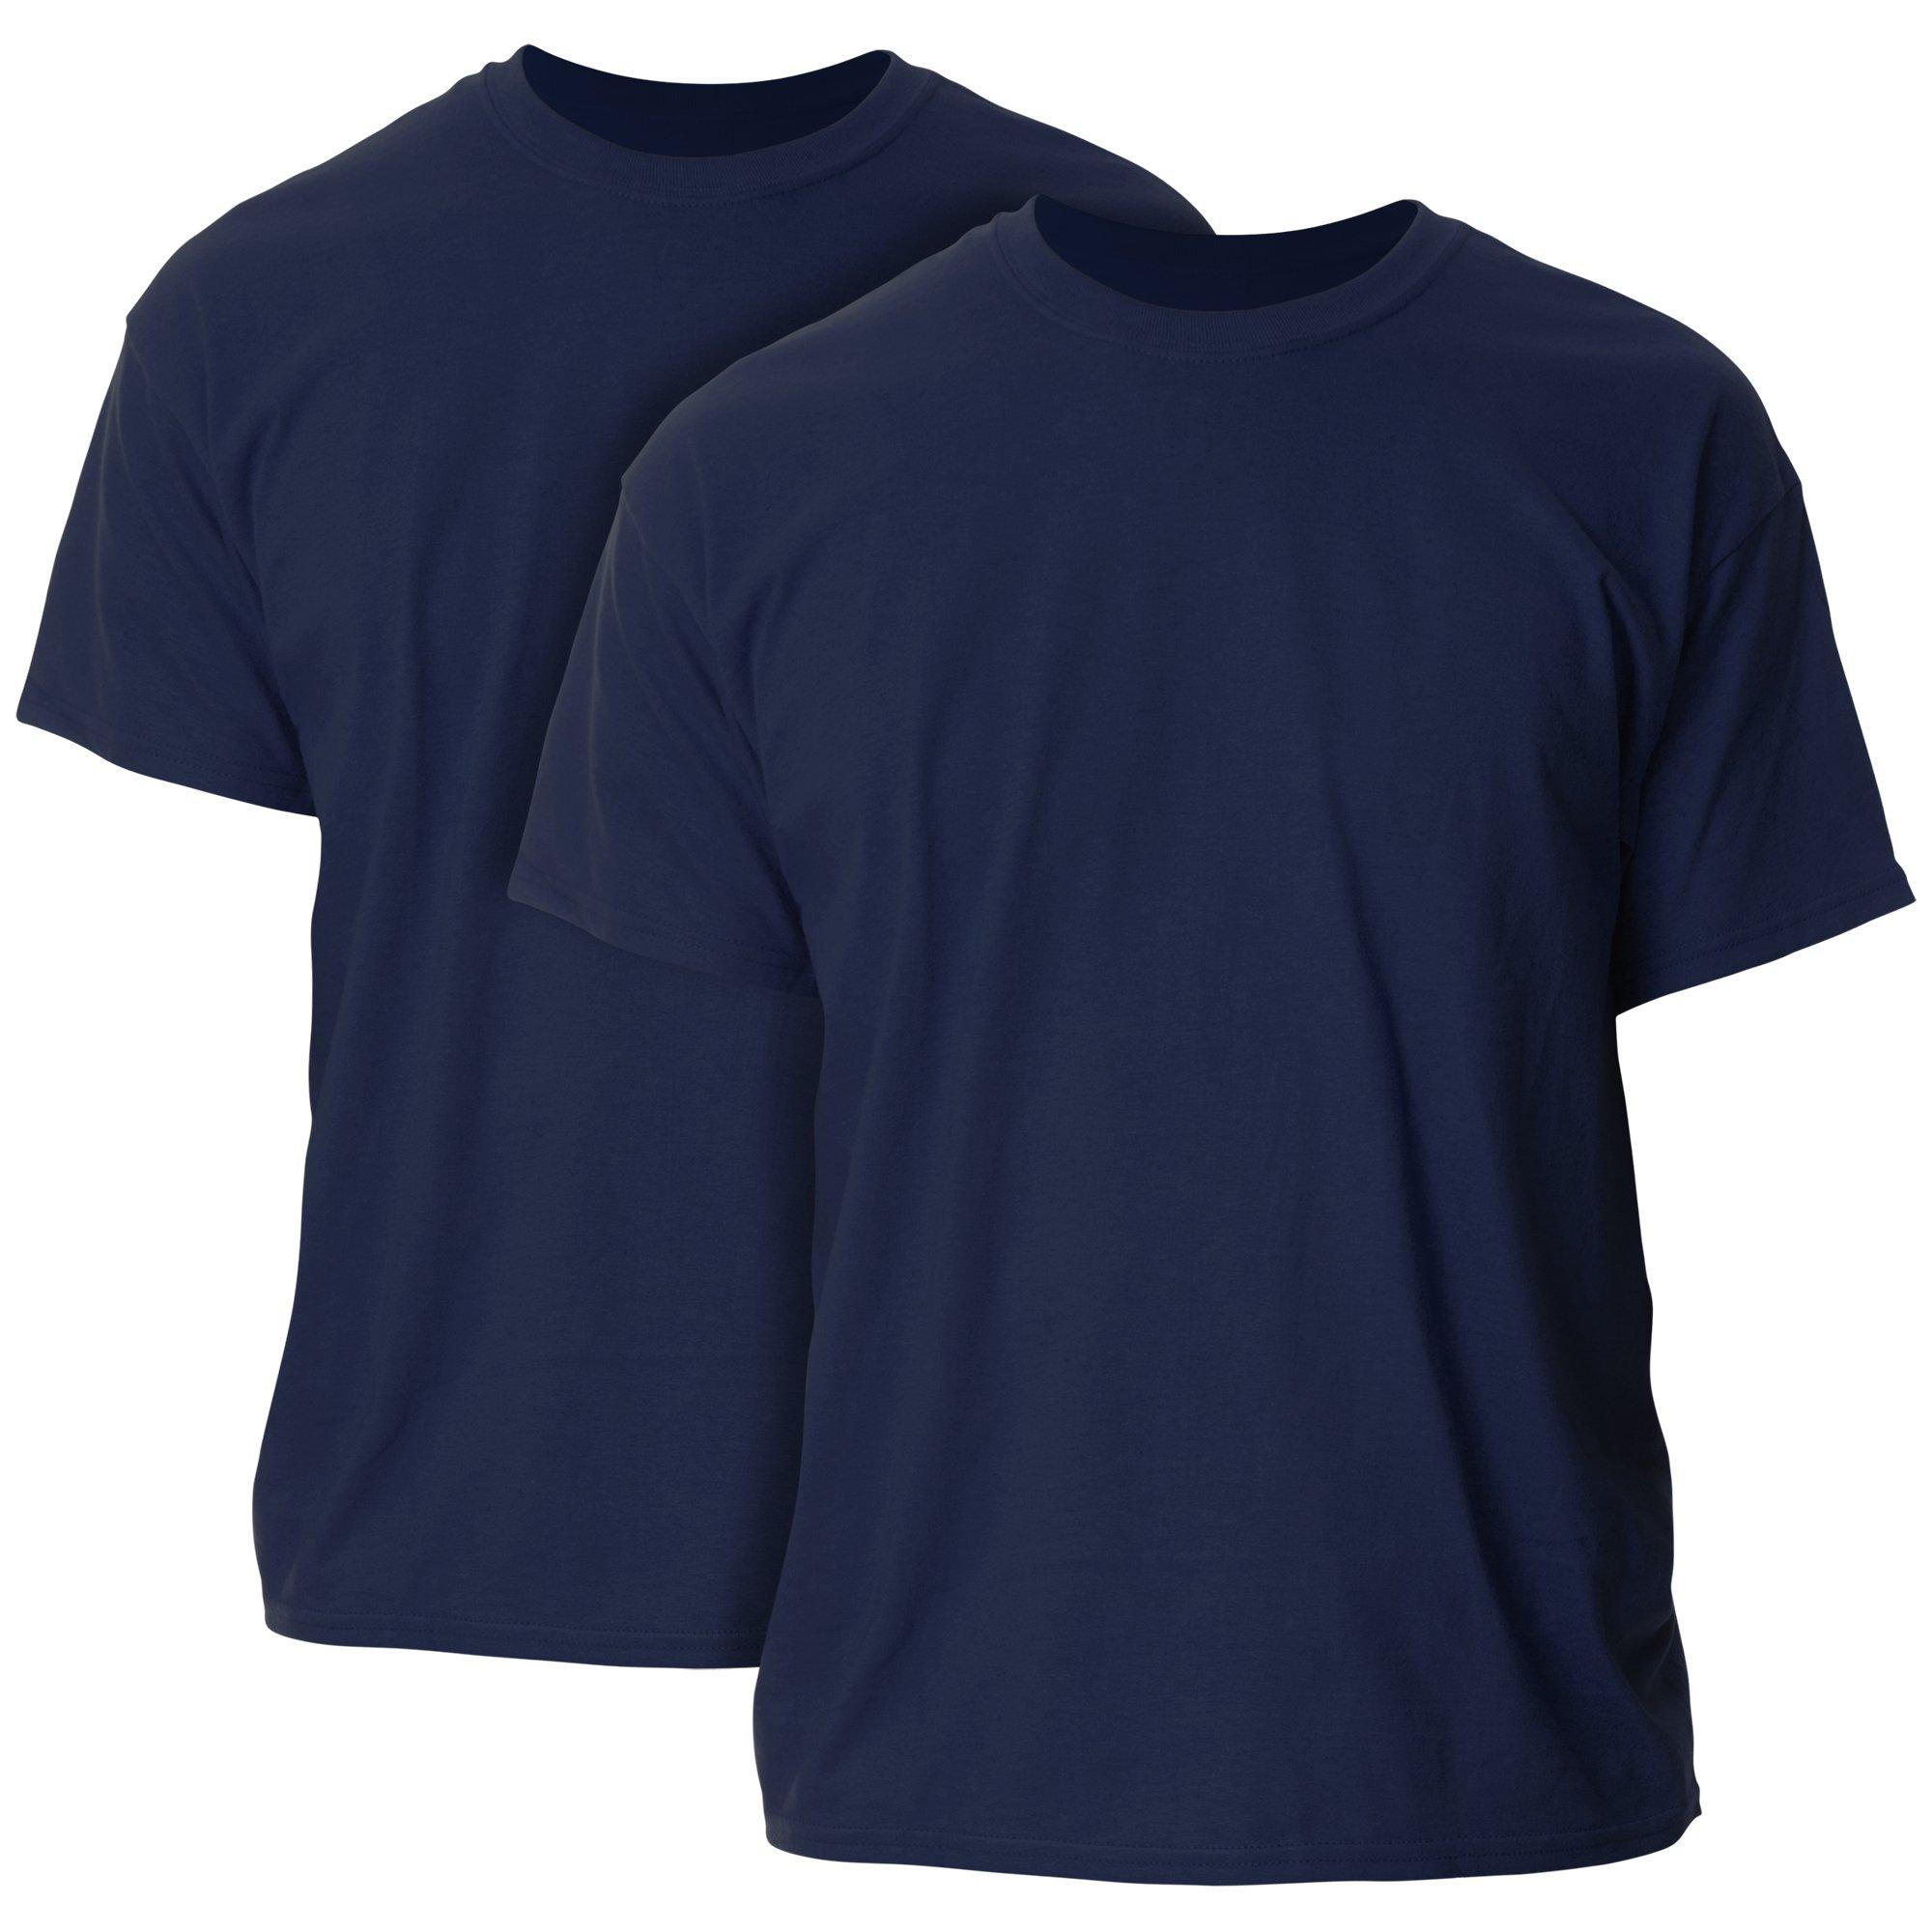 Gildan Men's Ultra Cotton Adult T-Shirt, 2-Pack, Navy, 3X-Large